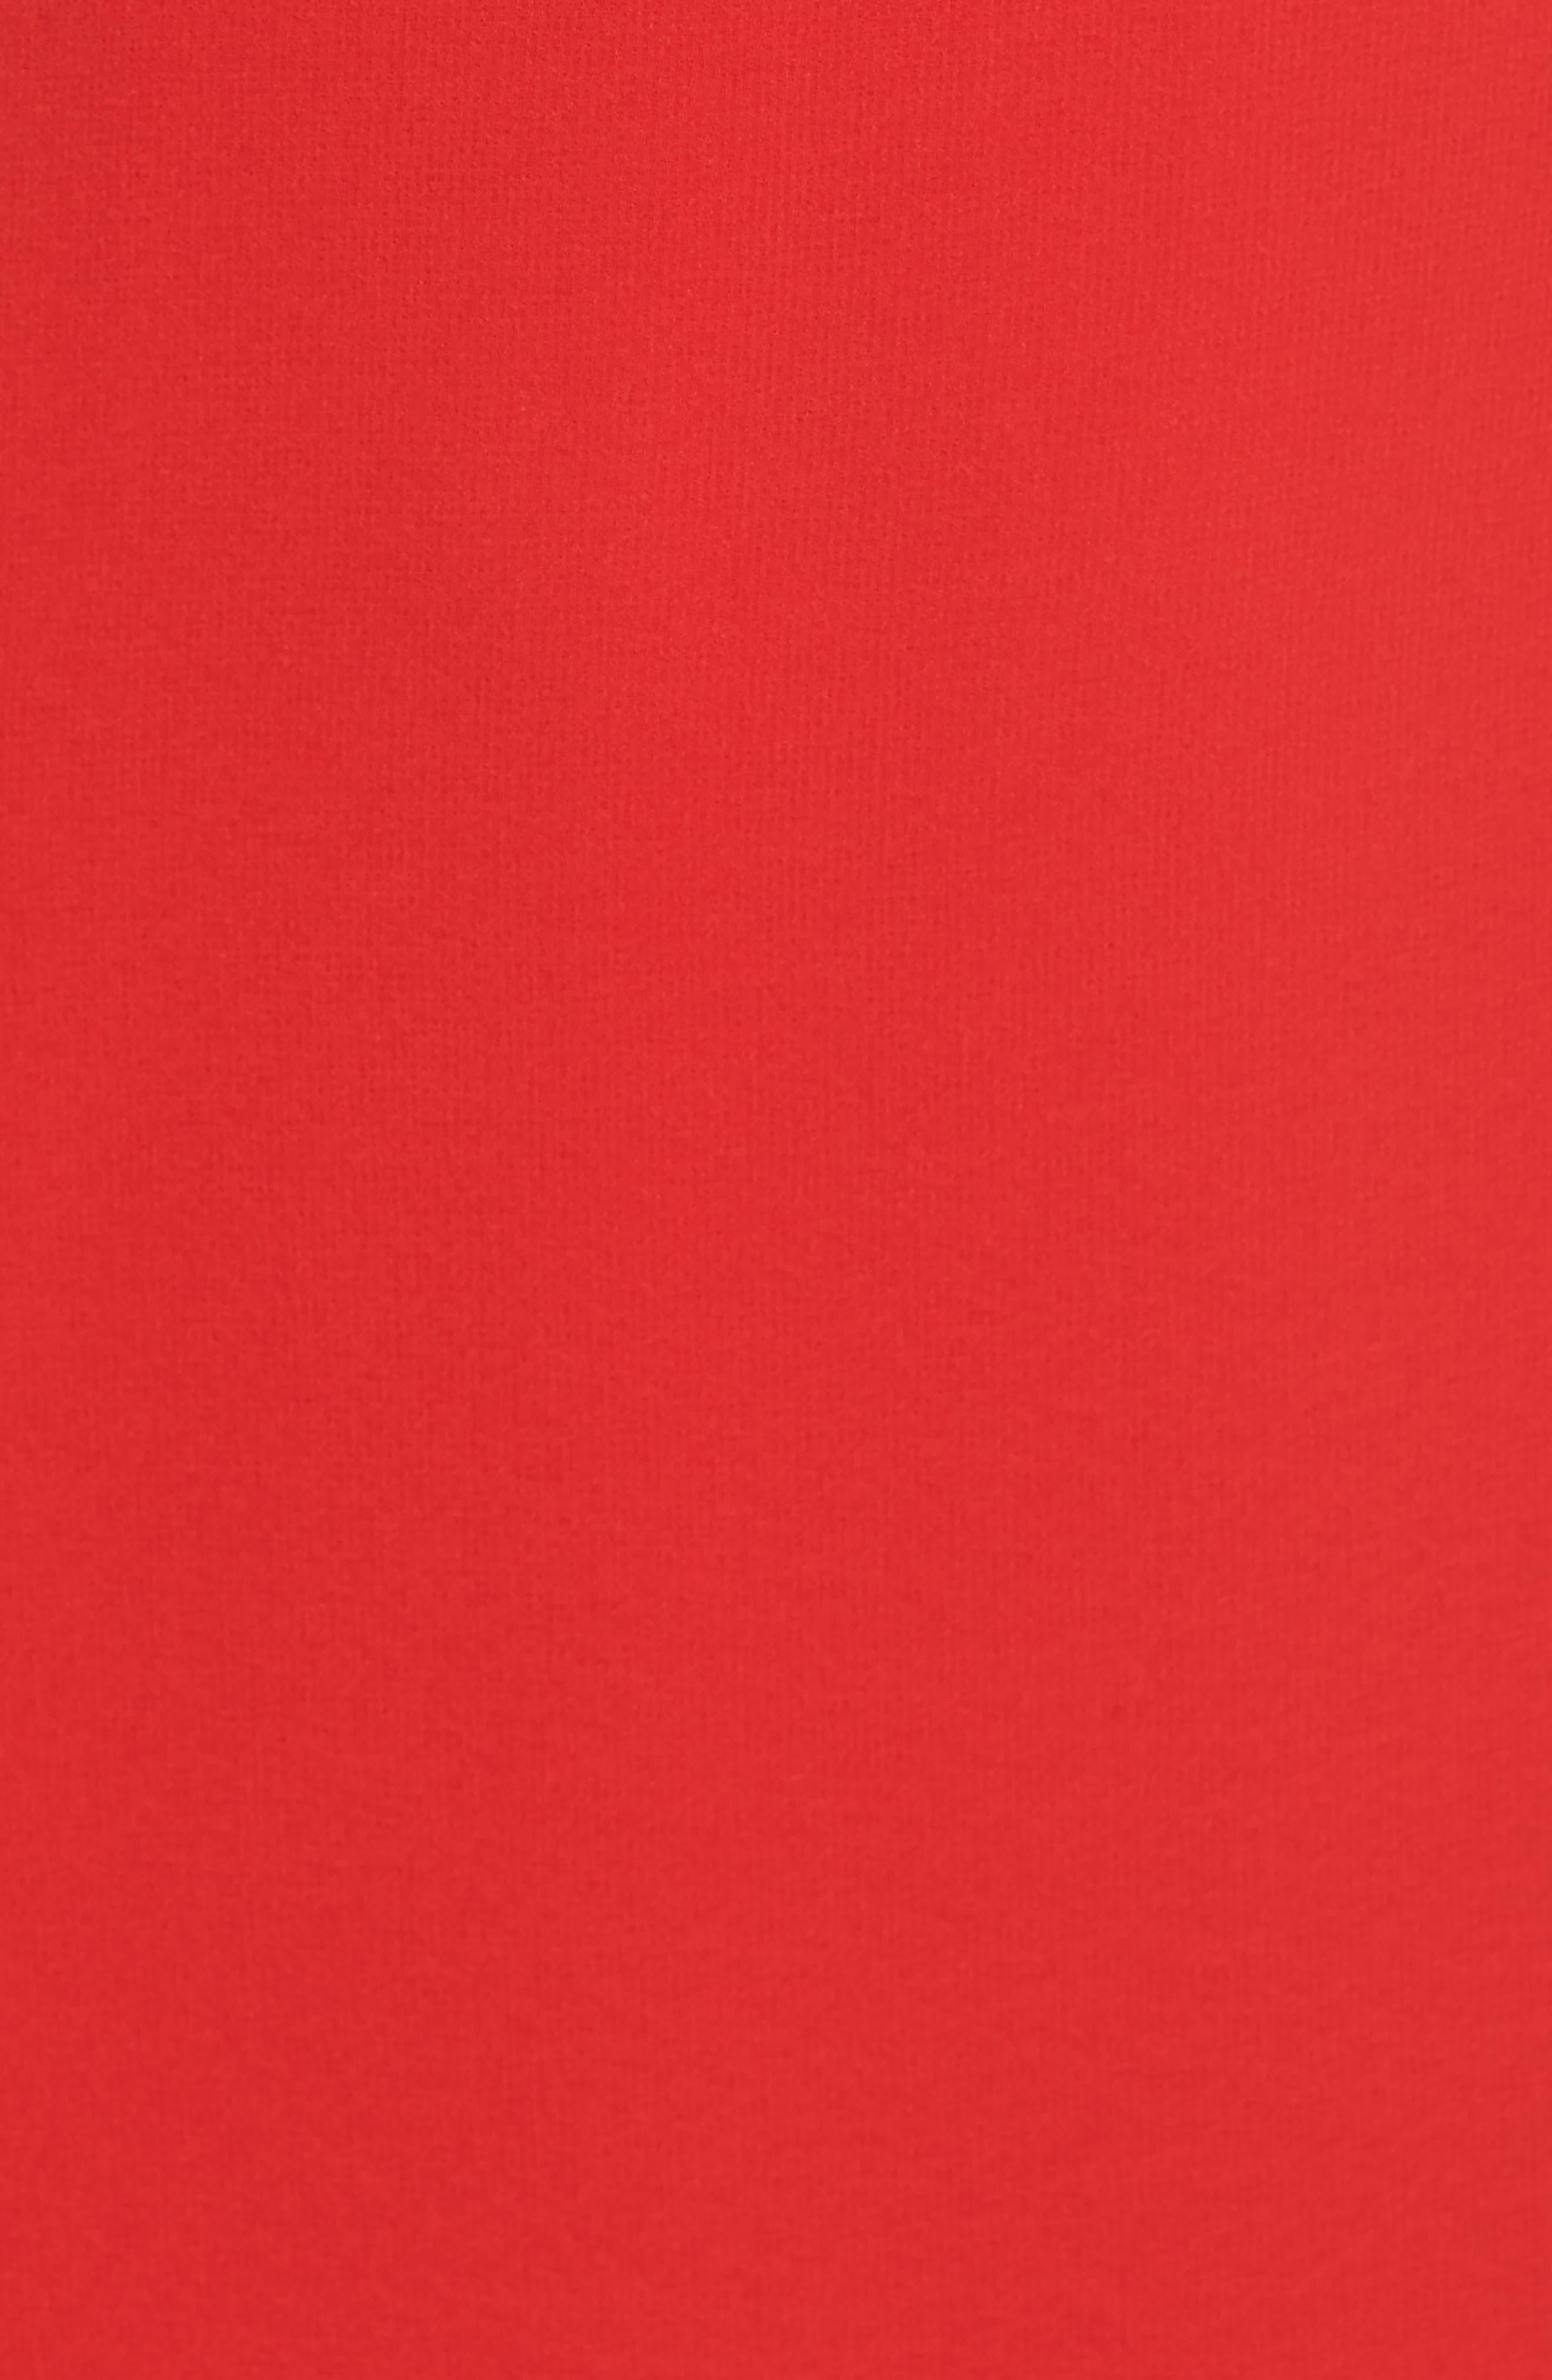 Ivie Asymmetrical Sheath Dress,                             Alternate thumbnail 5, color,                             624